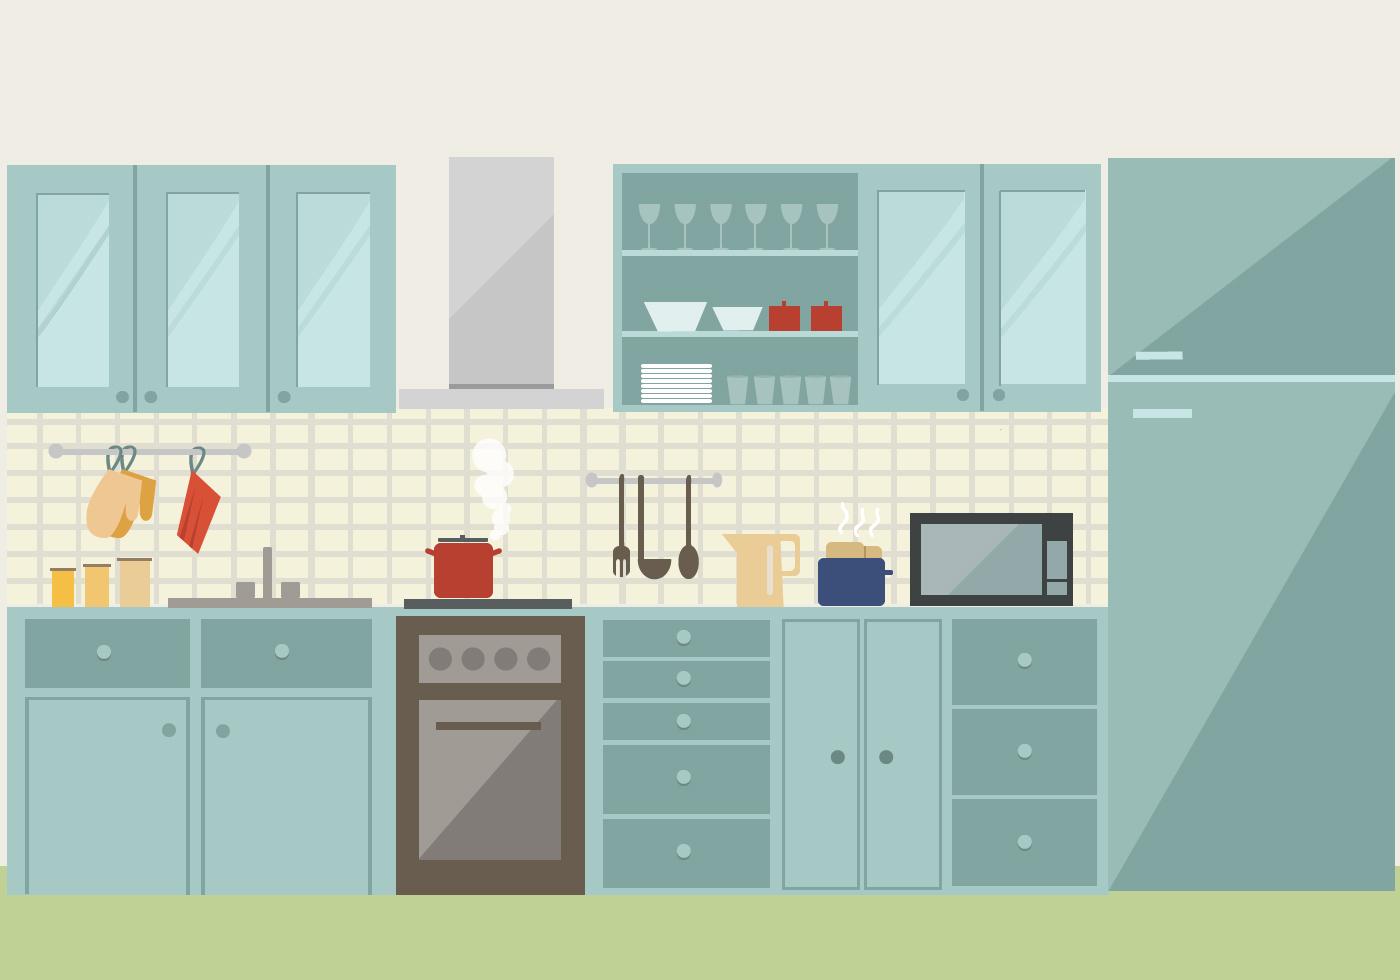 Vector Kitchen Illustration - Download Free Vector Art, Stock ...